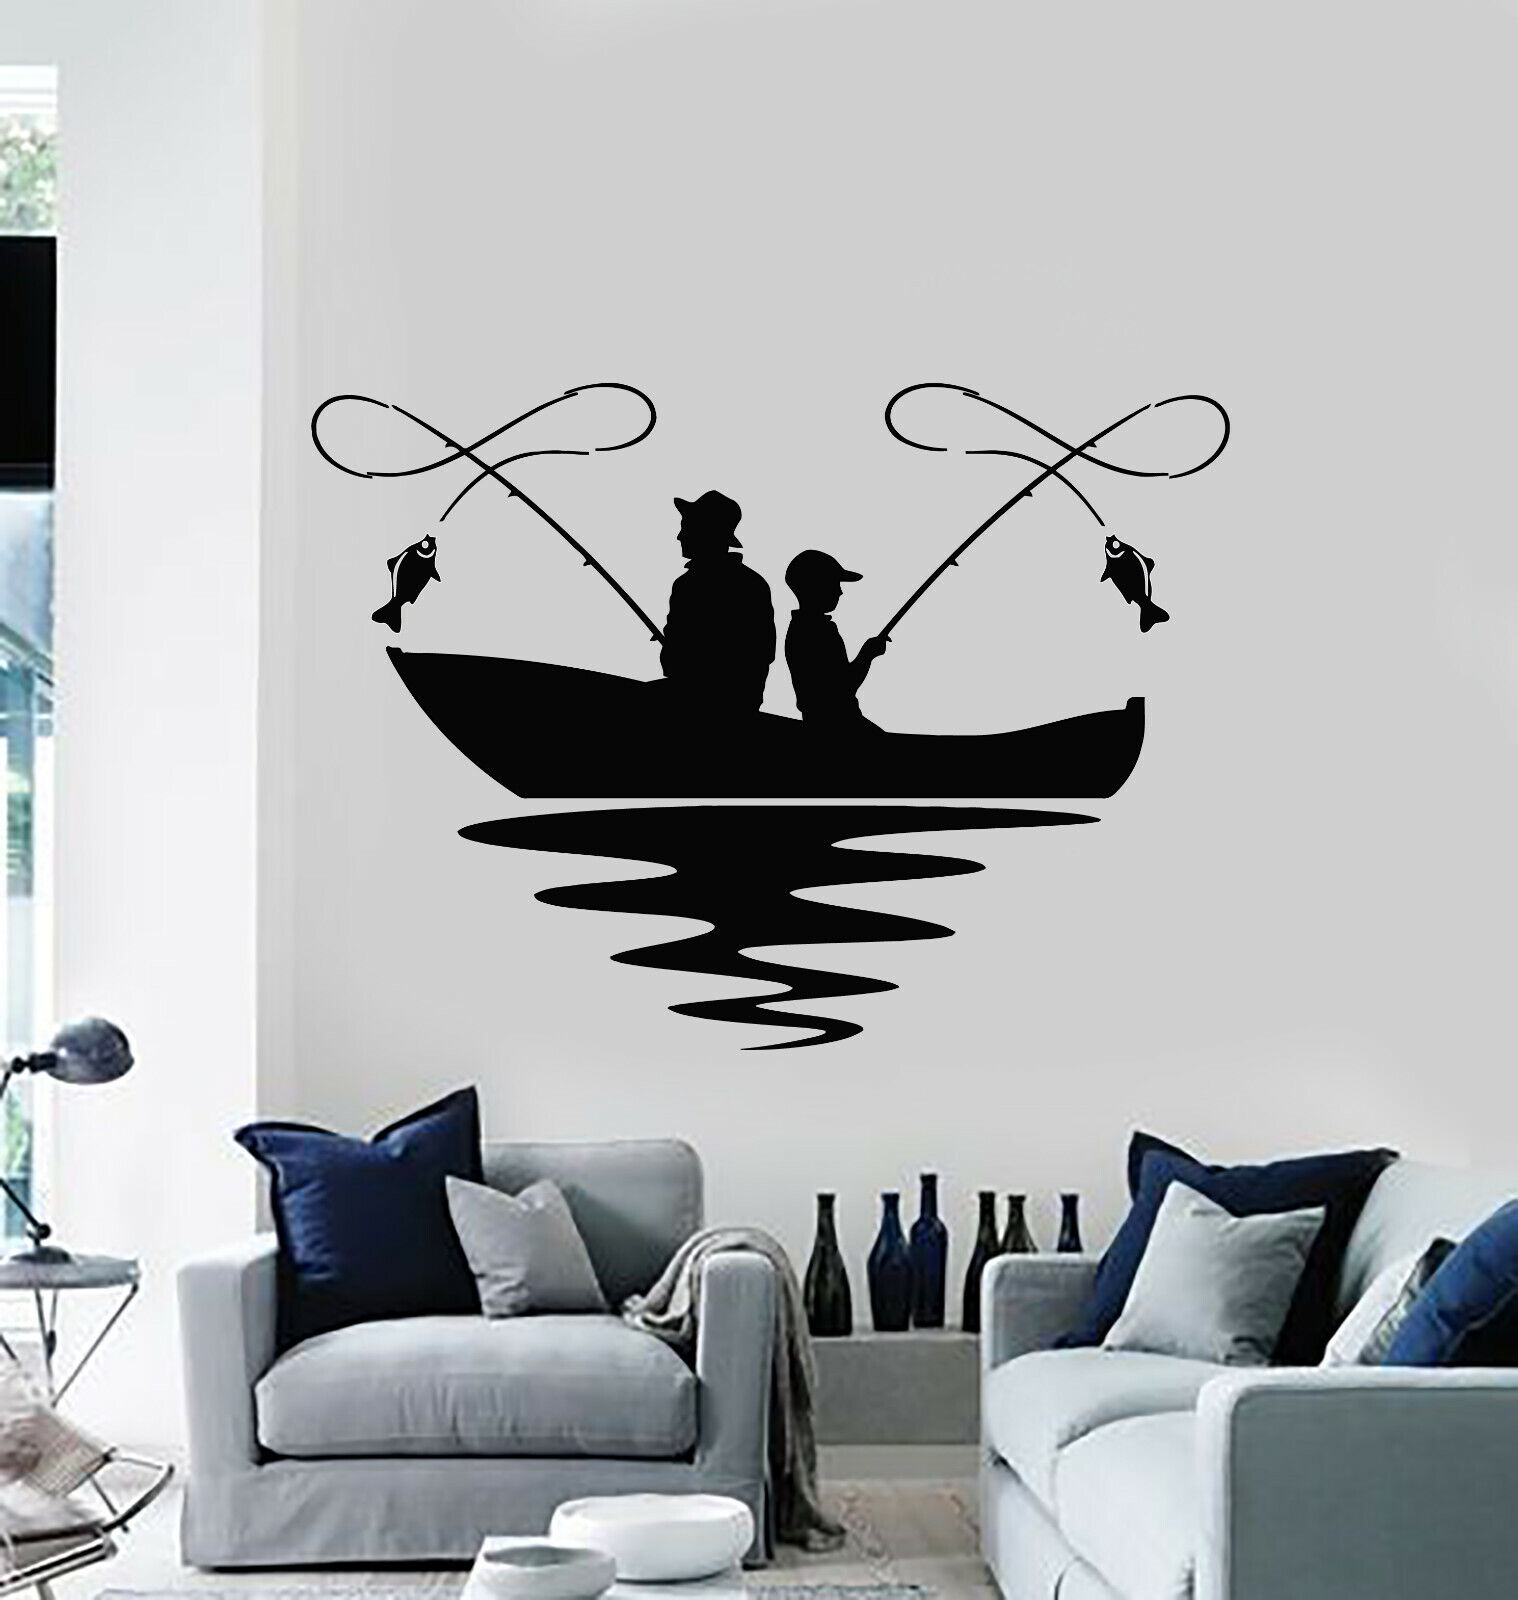 Vinyl Wall Decal Fishing Lake Boat Hobby Fish Club Relax Sti